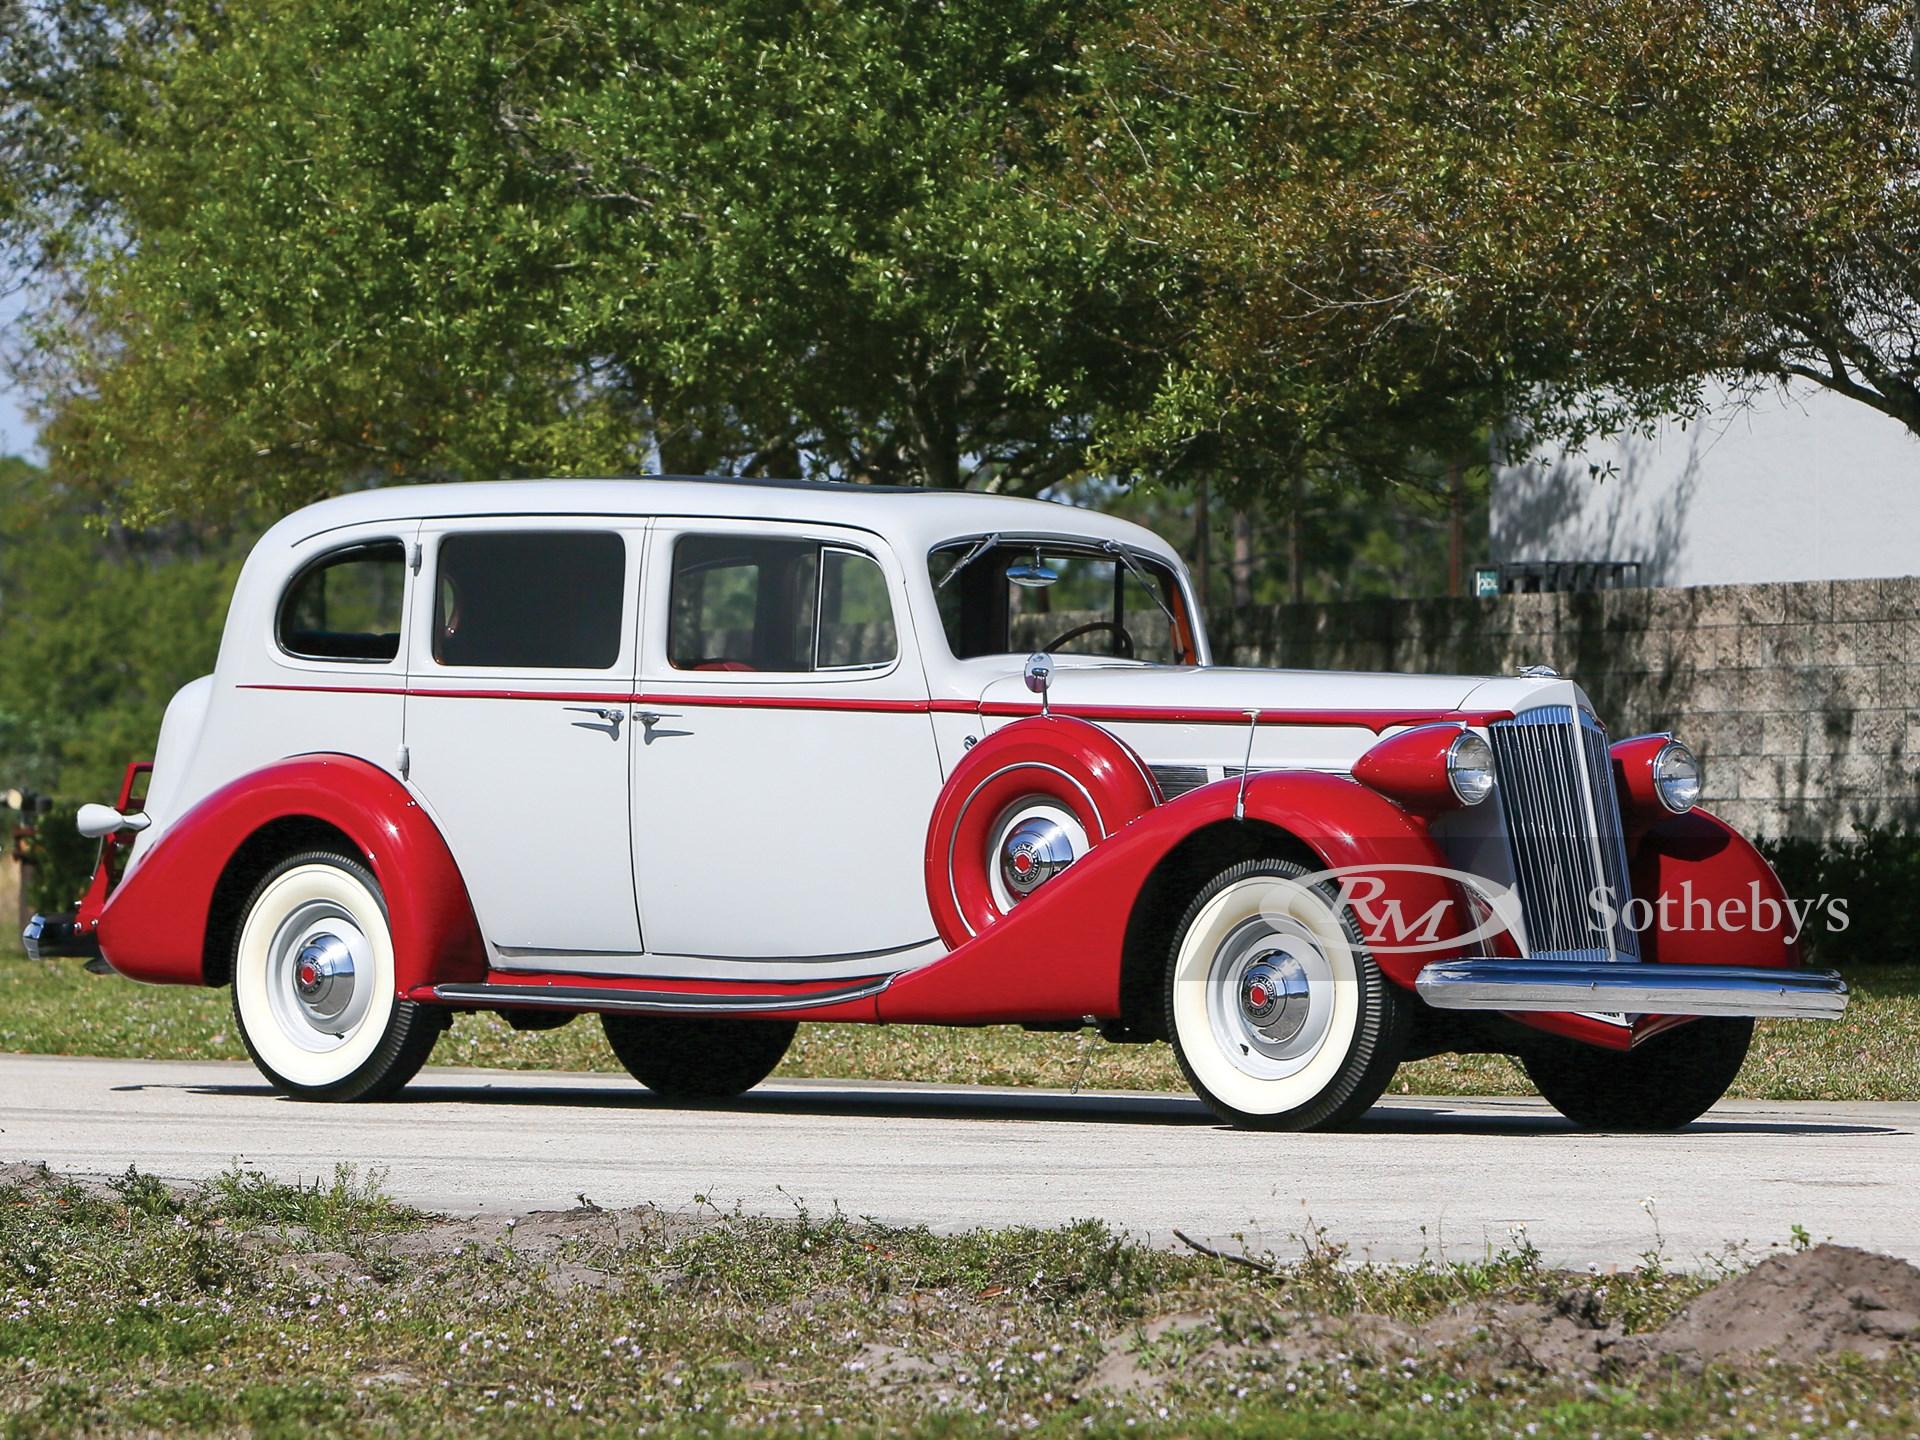 1937 Packard Super Eight Touring Sedan